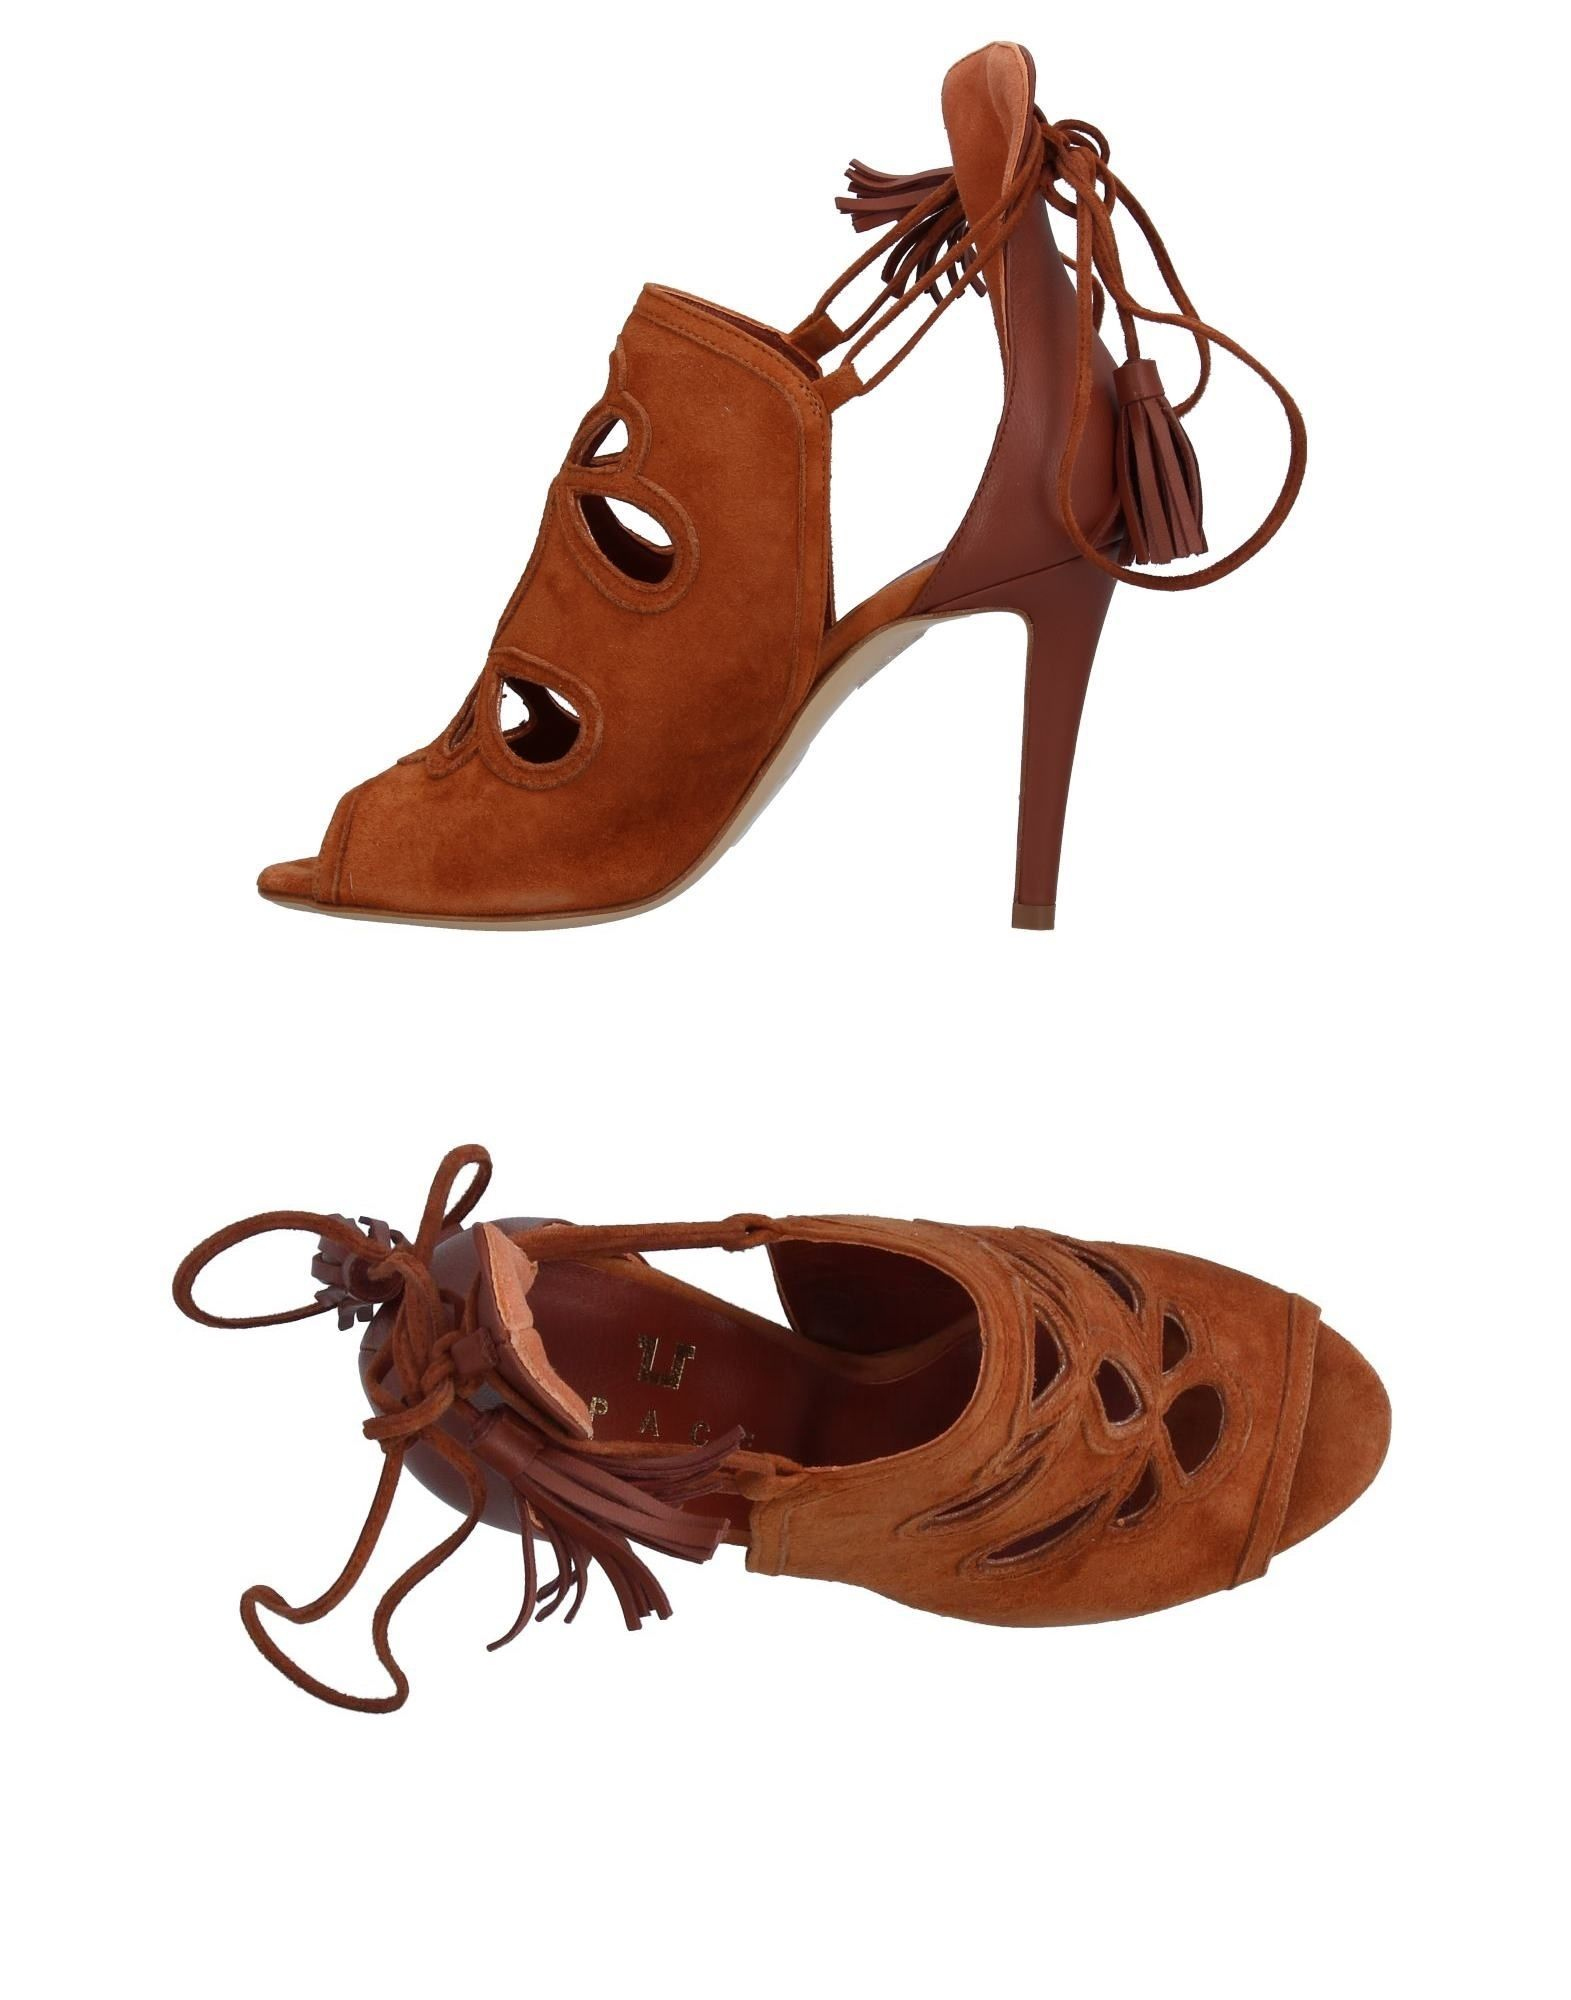 Space Style Concept Sandalen Damen  11364929QW Gute Qualität beliebte Schuhe